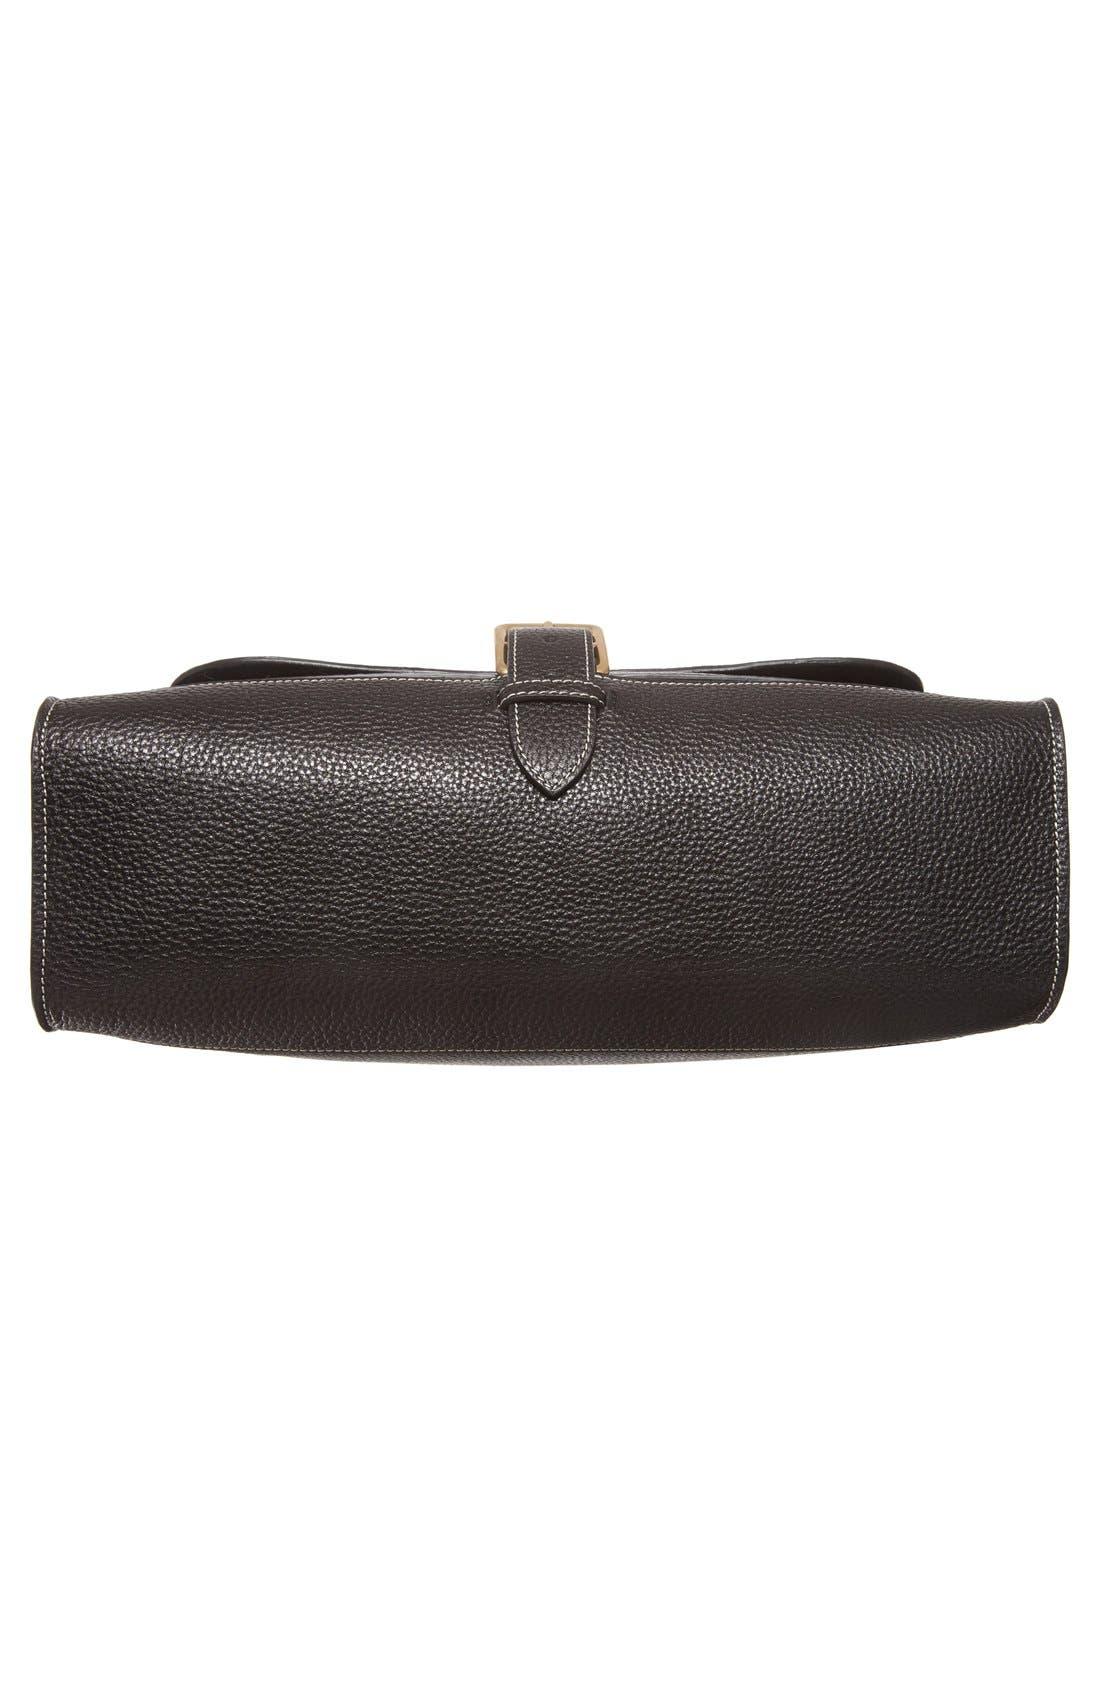 'Small Buckle' Leather Shoulder Bag,                             Alternate thumbnail 6, color,                             001